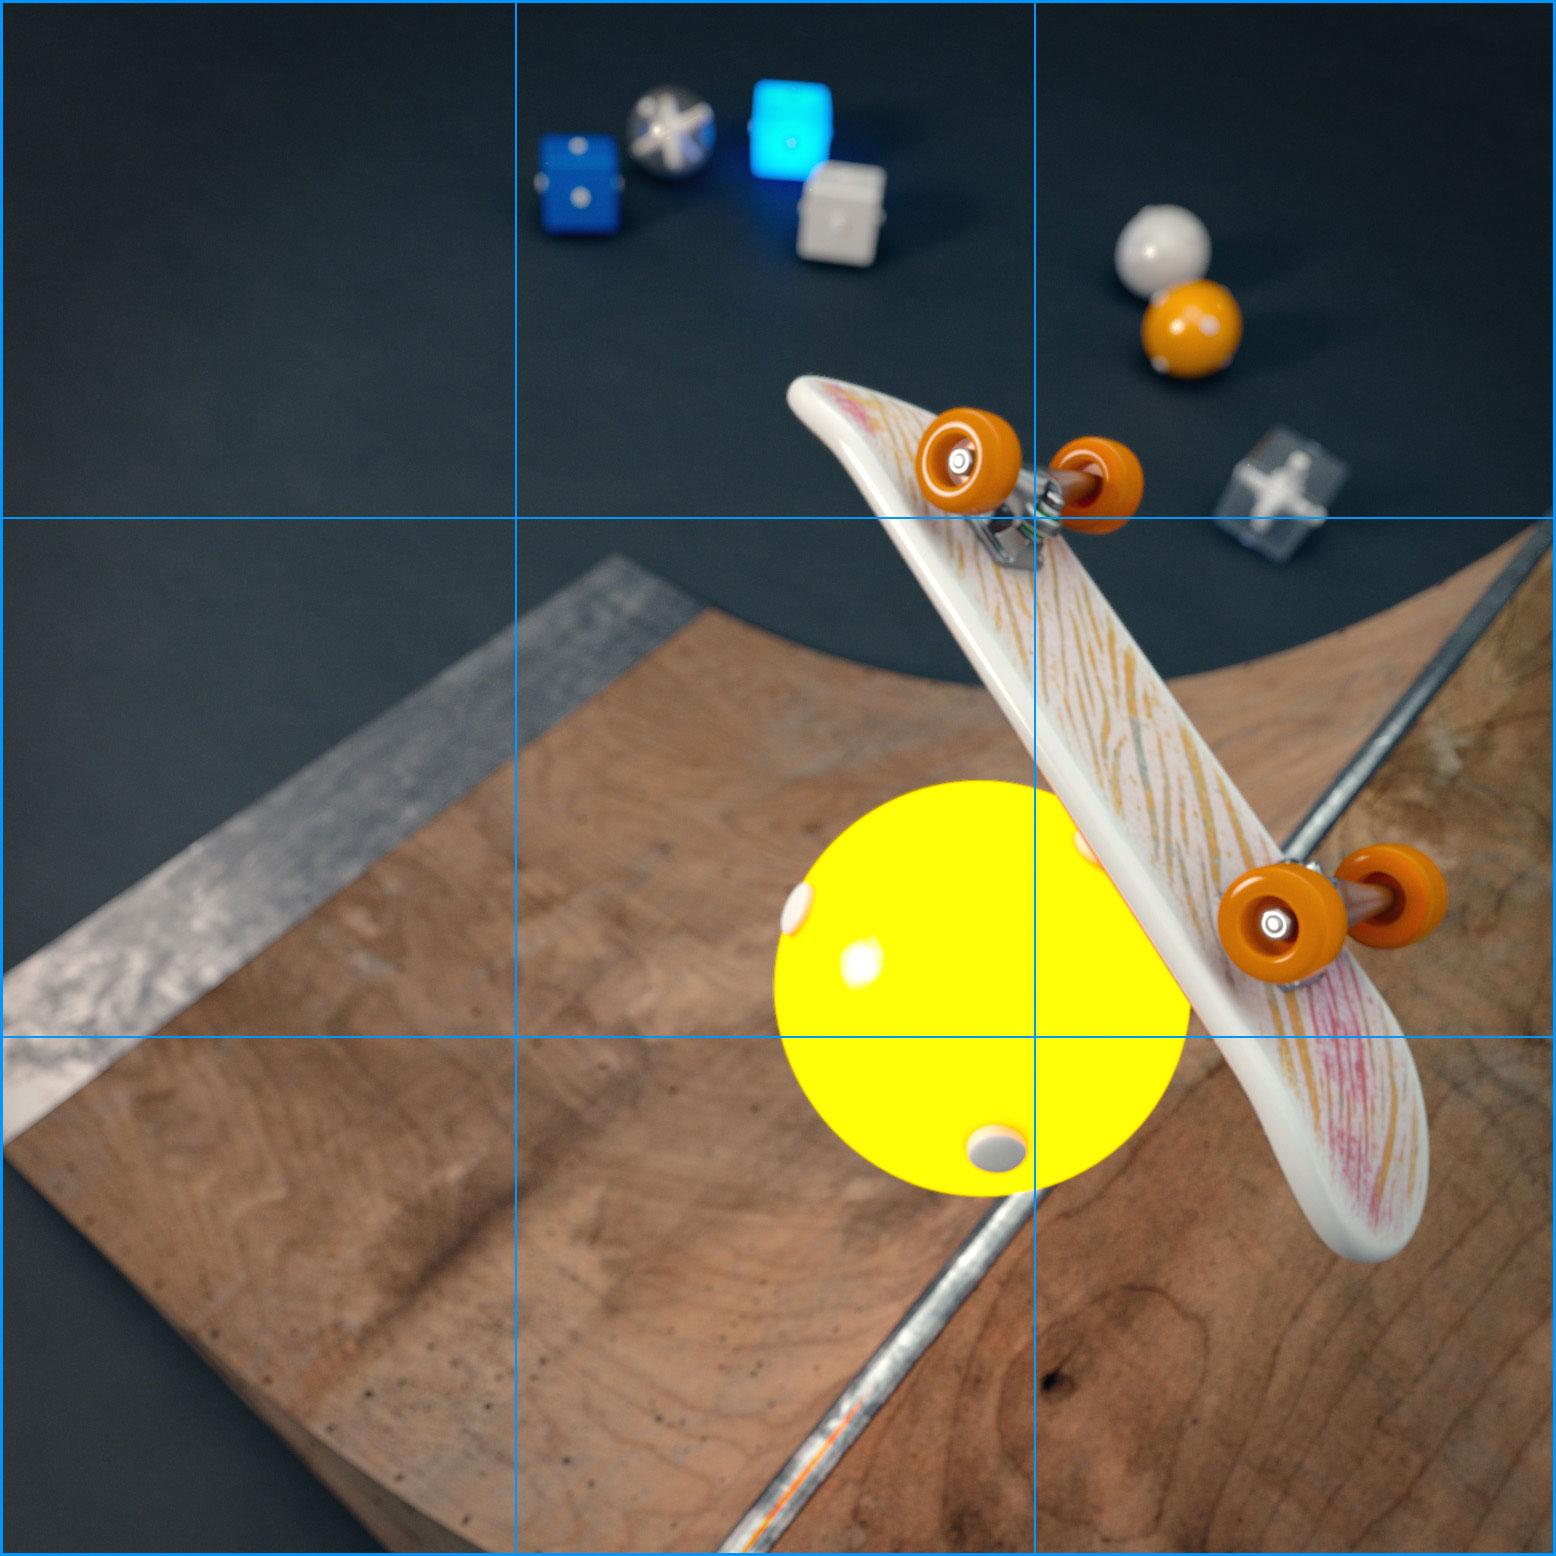 Display guides PixelSquid studio tool